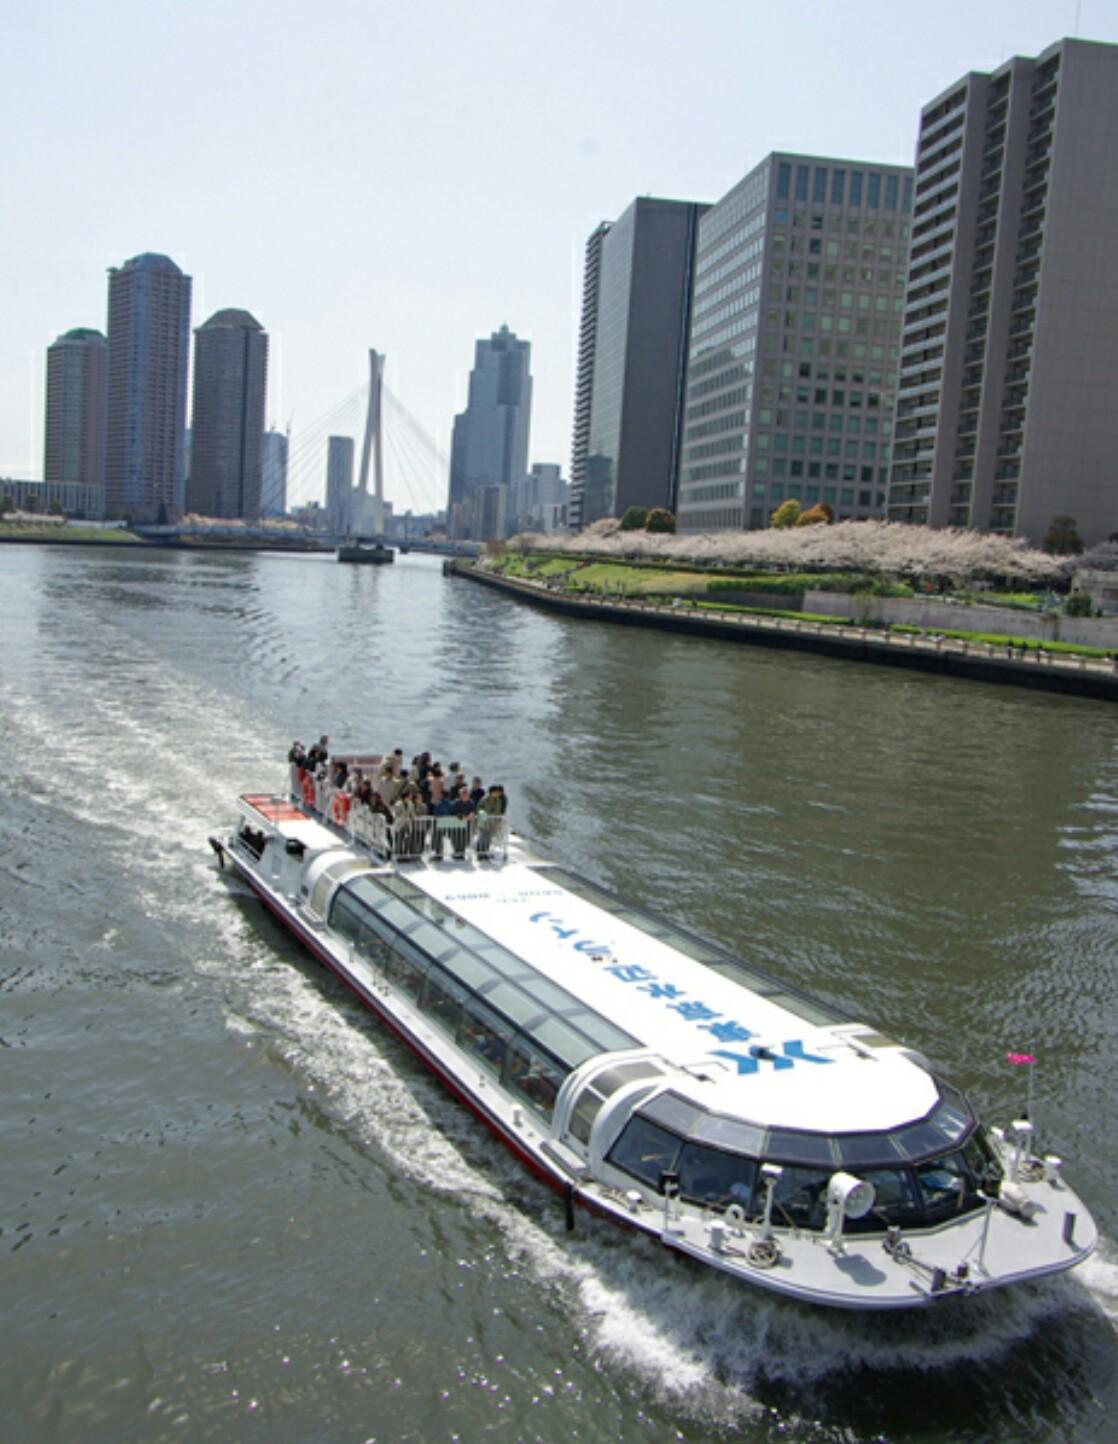 Boat cruise to Asakusa on the Sumidagawa river